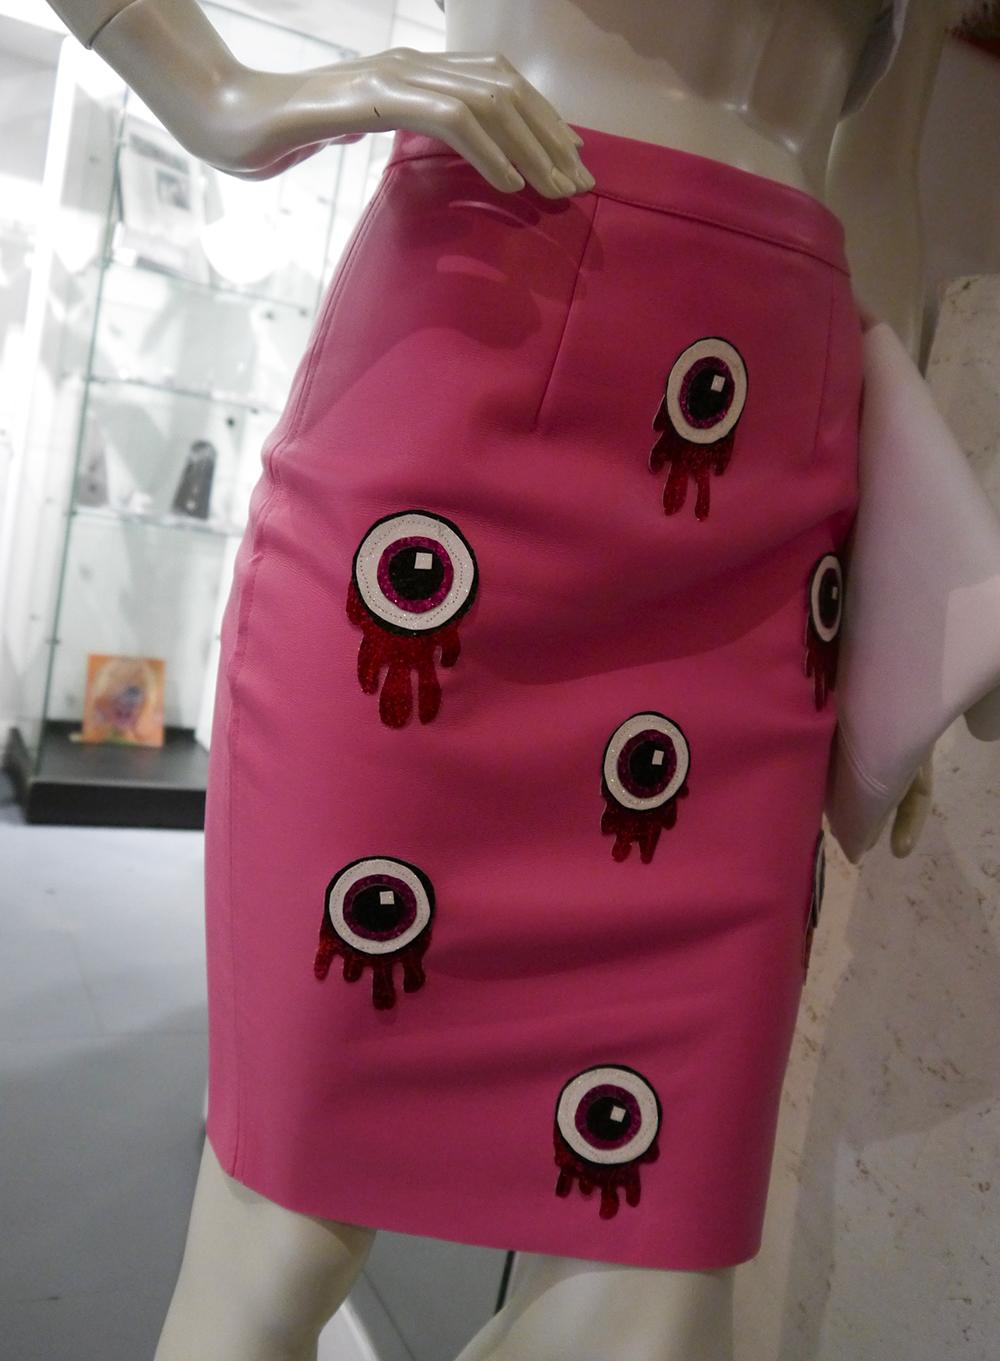 The Scottish Design Exchange, Edinburgh shopping, alternative shopping in Edinburgh, Ocean Terminal, fashion, Scottish fashion blogger, Never Monday, eyeball skirt